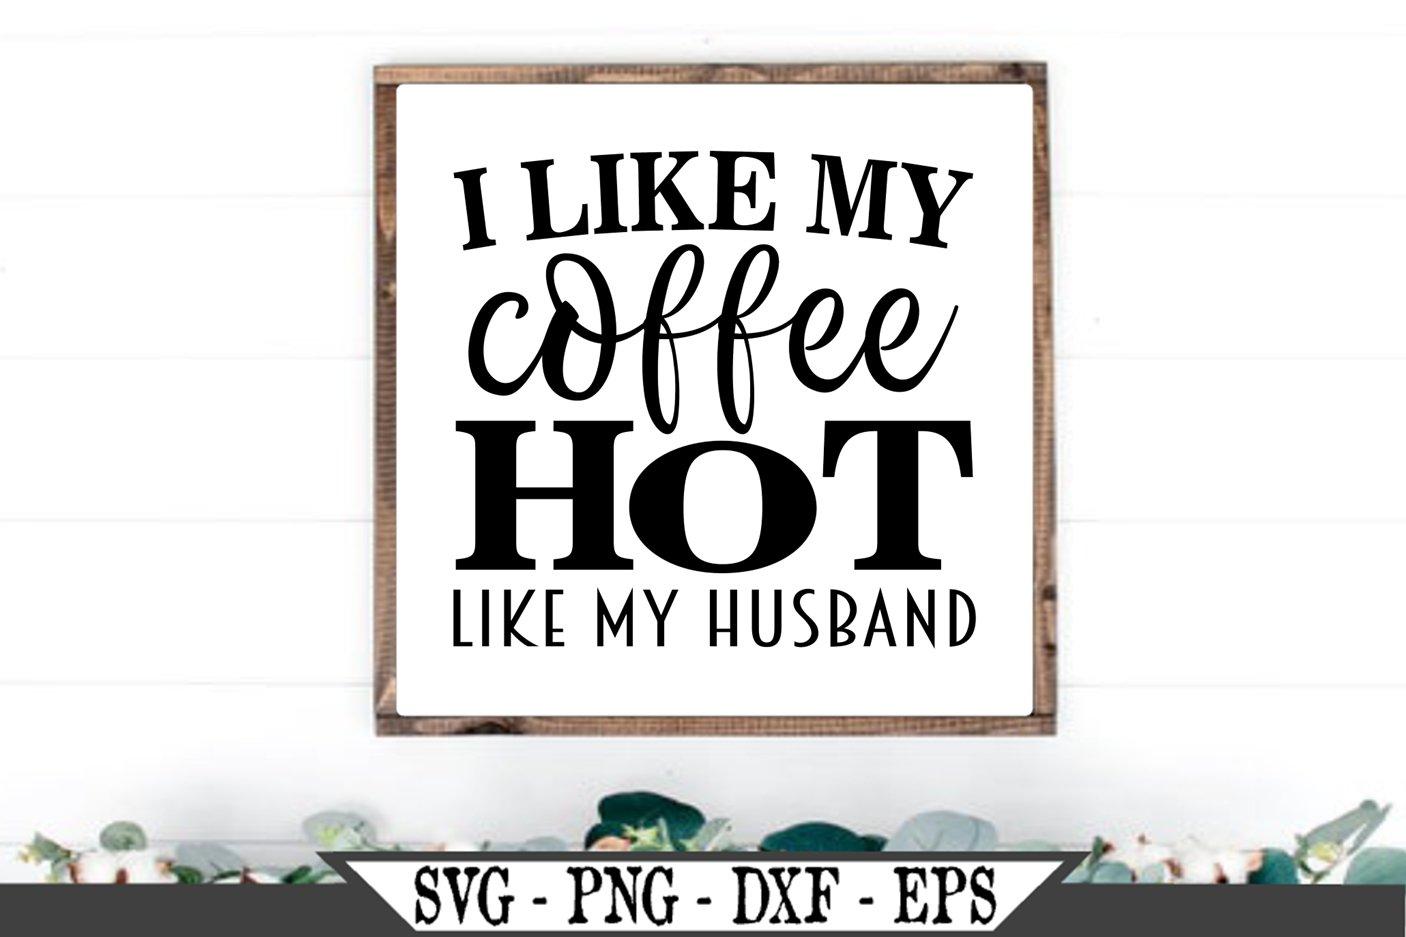 My my wife is husband My Husband's